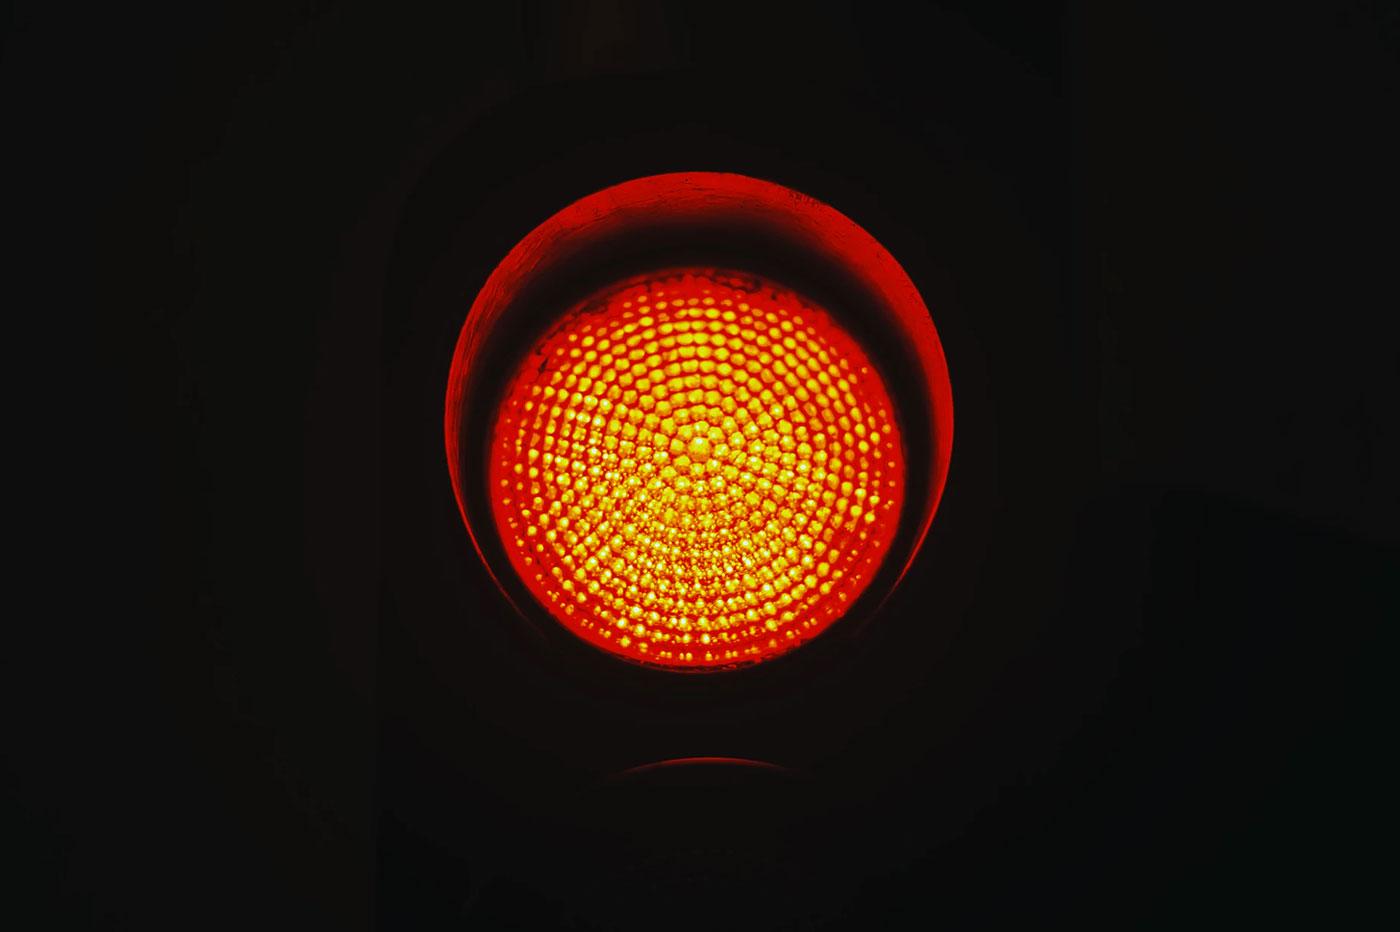 Tesla en feu rouge